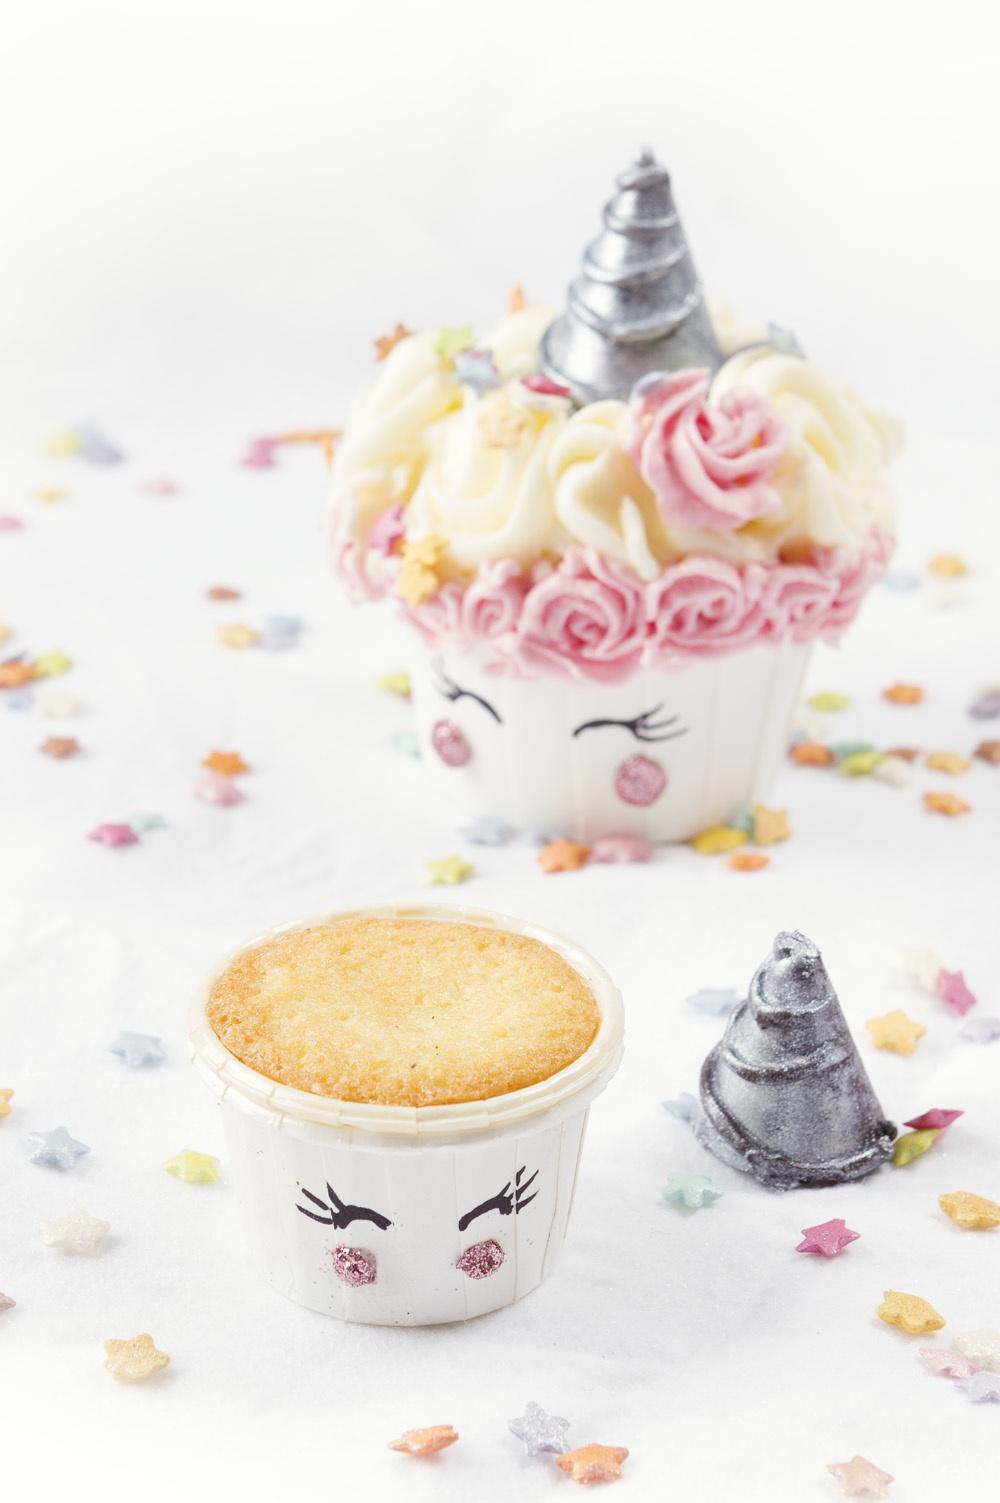 Champicorne cupcake - Studio de creation - Qui a vole les tartes (3)